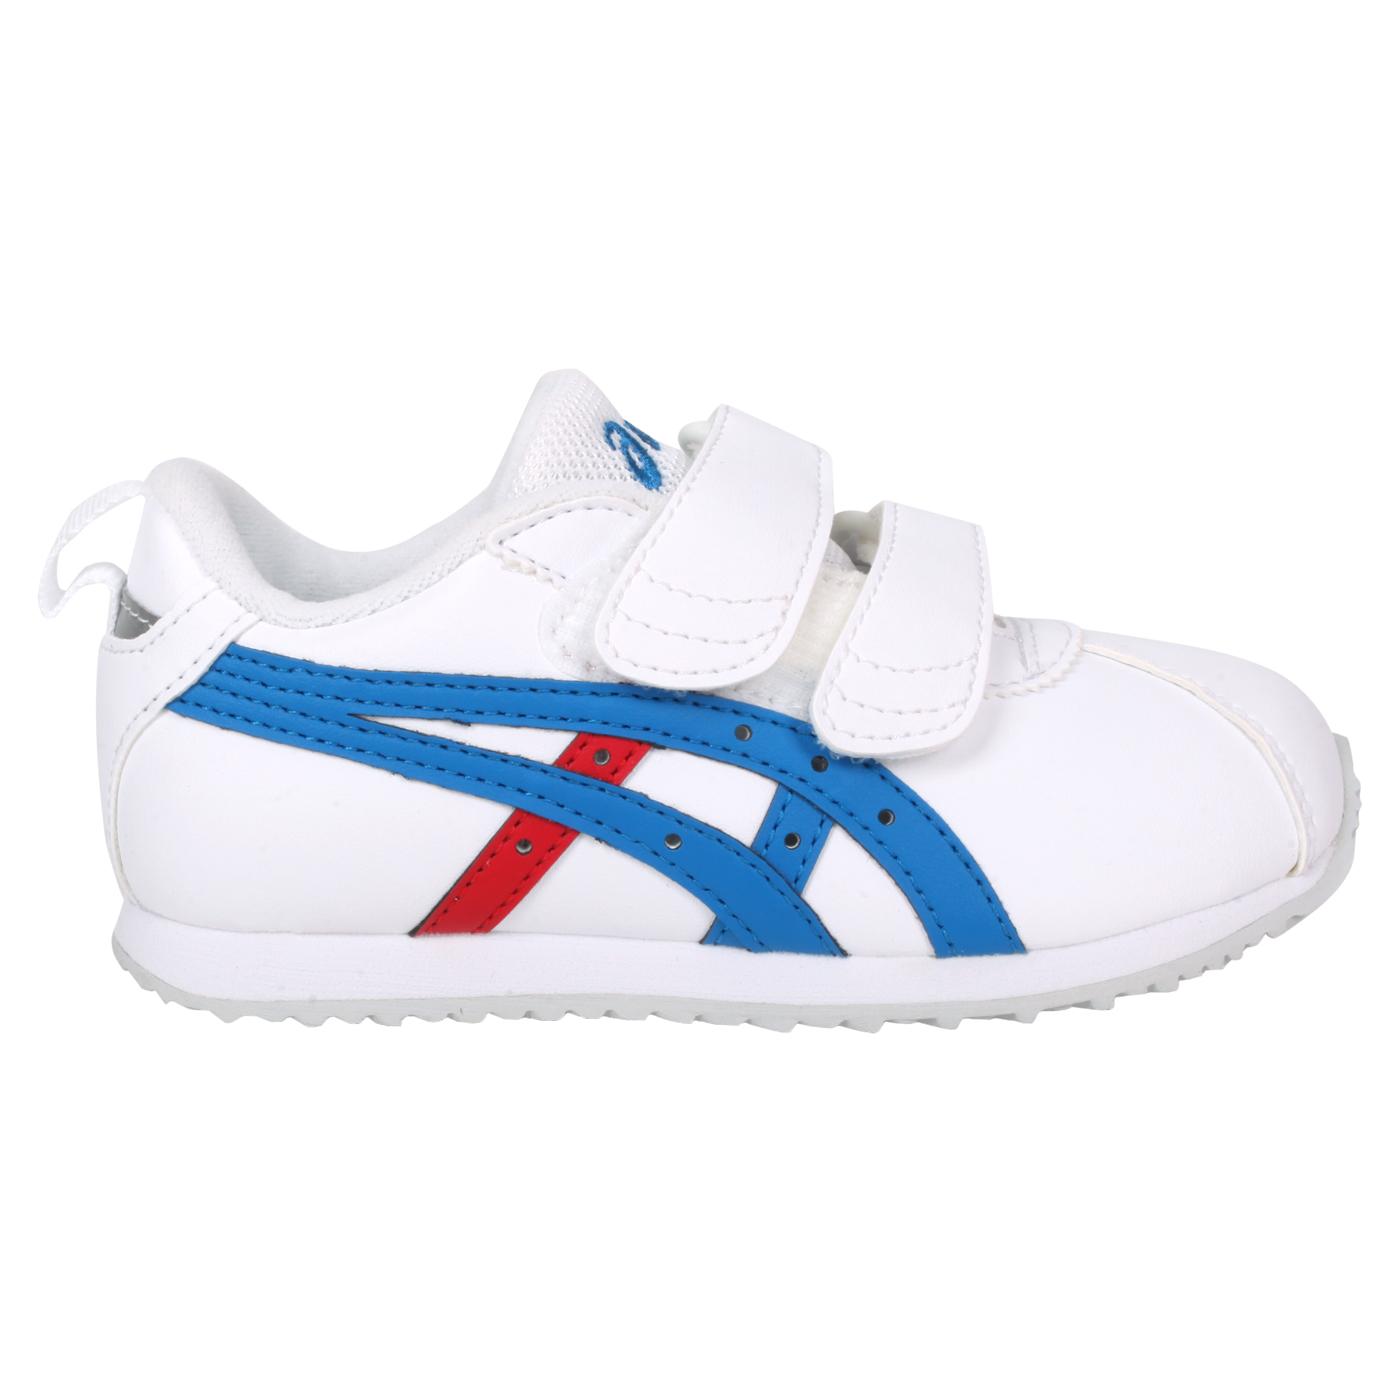 ASICS 大童運動鞋  @CORSAIR MINI SL 2@1144A152-101 - 白藍紅